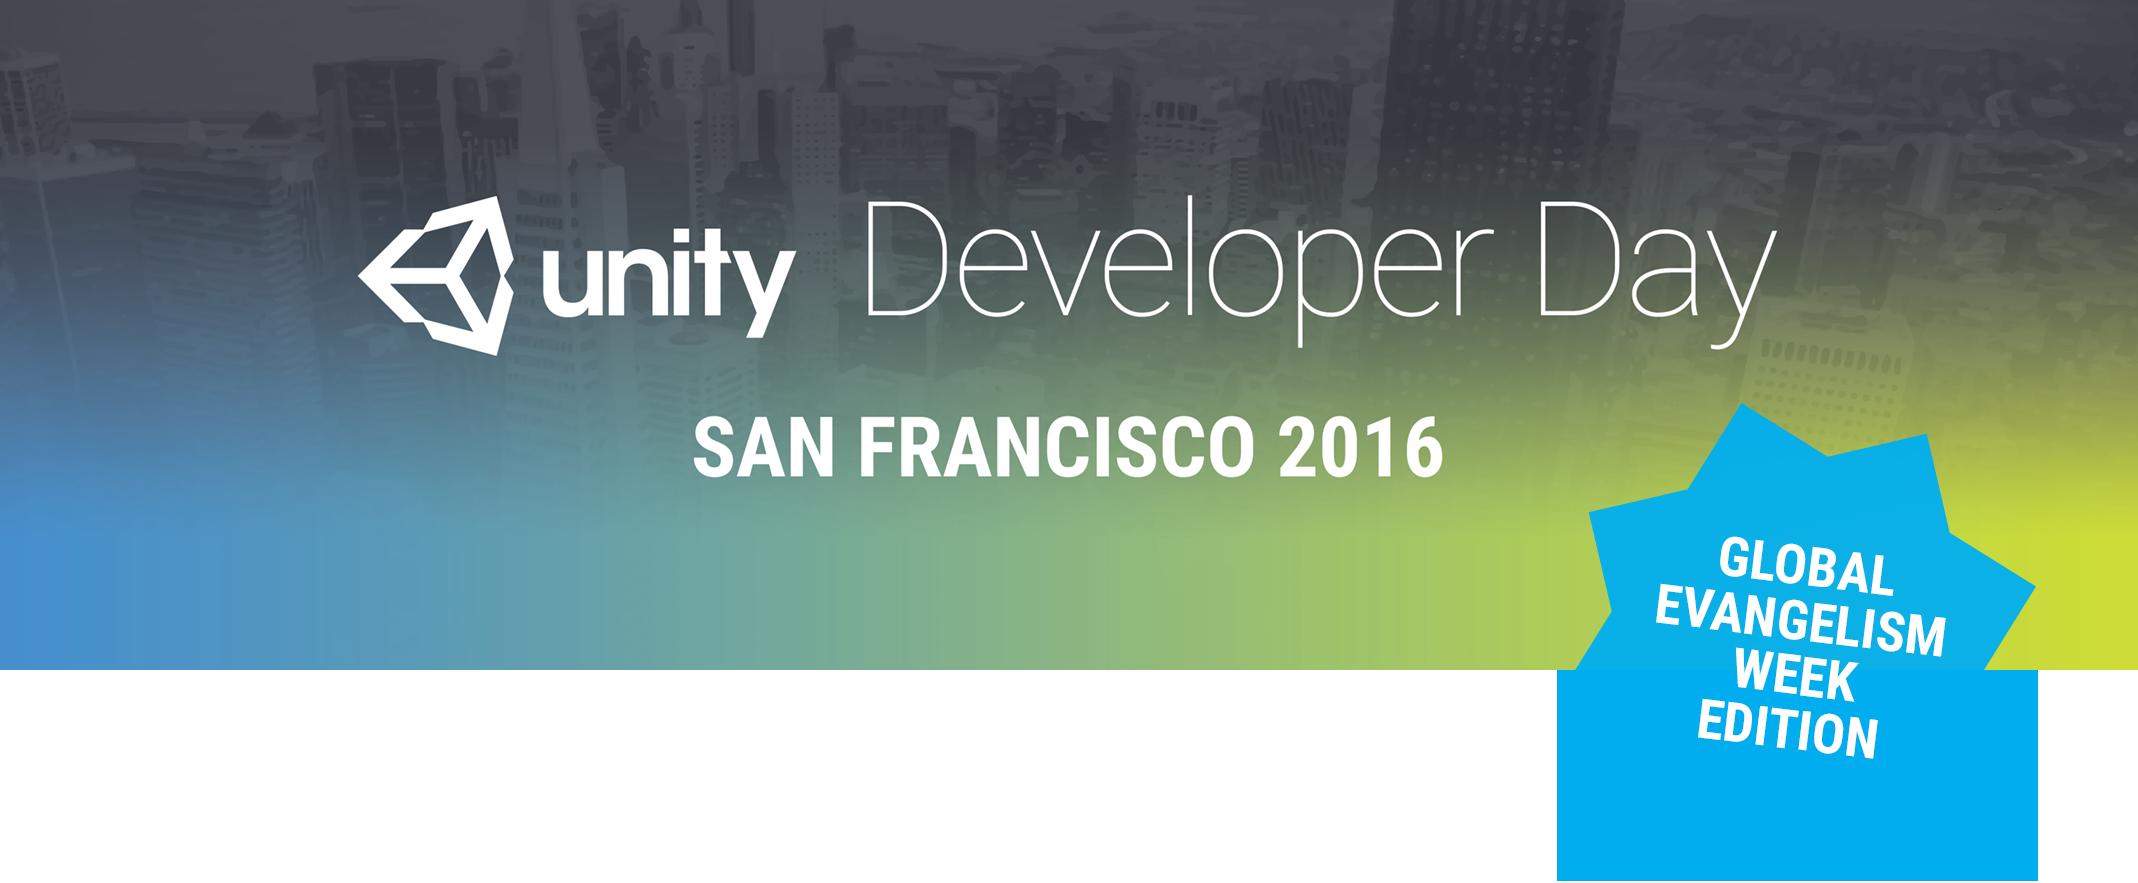 Unity Developer Day: San Francisco 2016